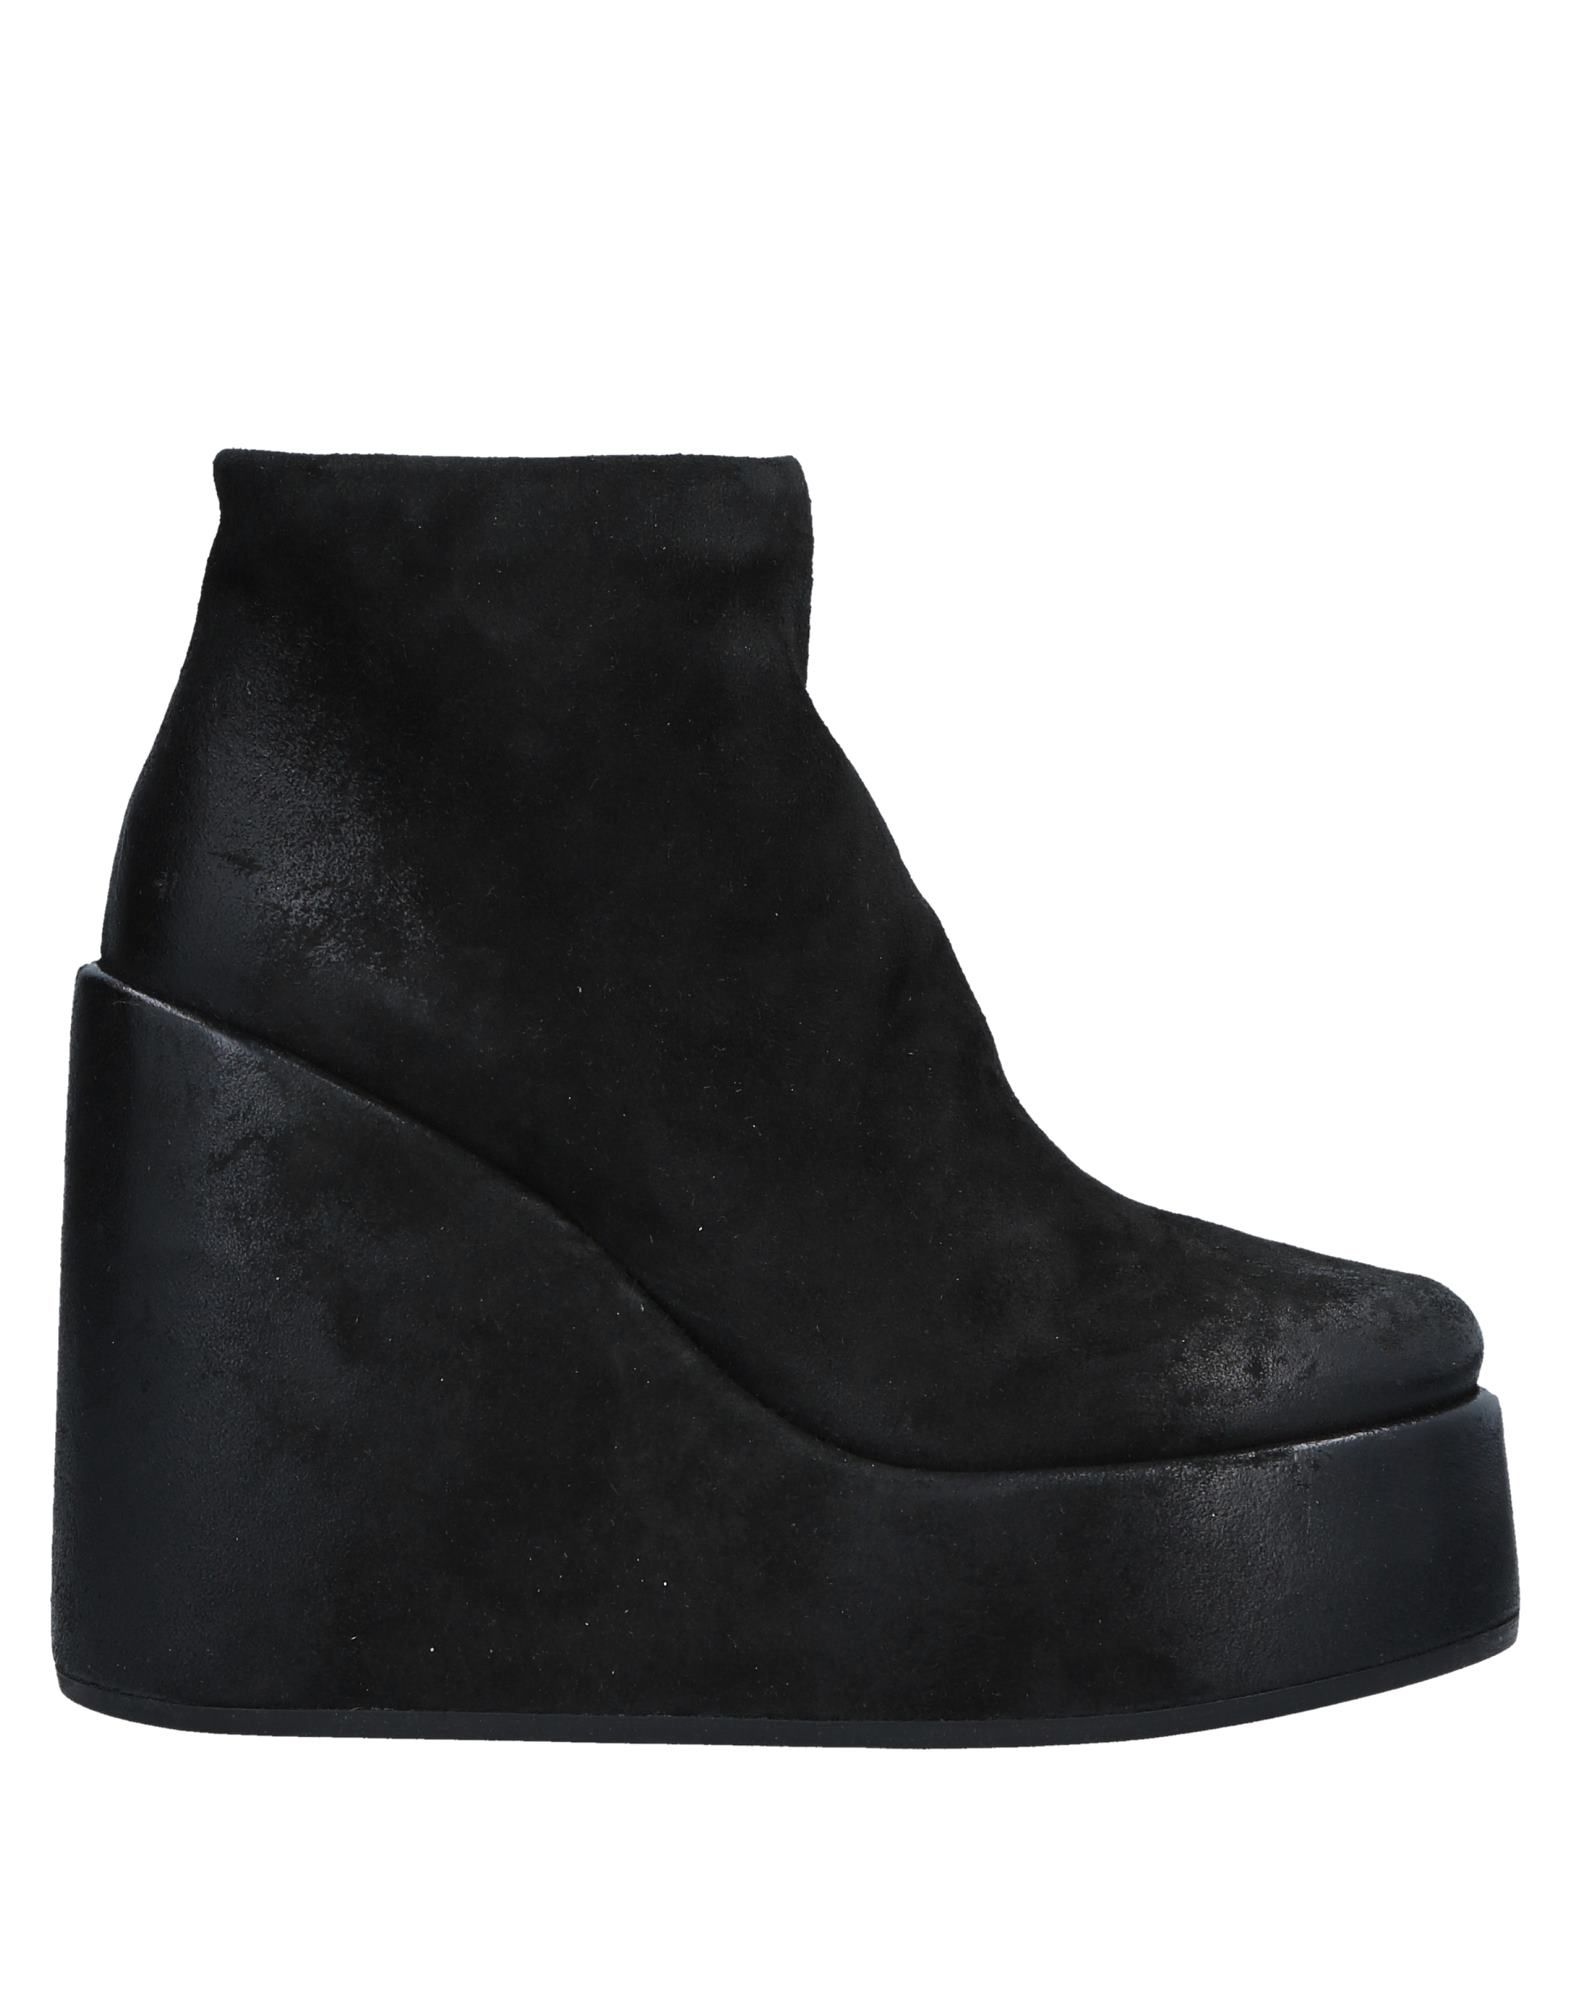 Marsèll Stiefelette Damen Schuhe  11537420RBGünstige gut aussehende Schuhe Damen e8e012